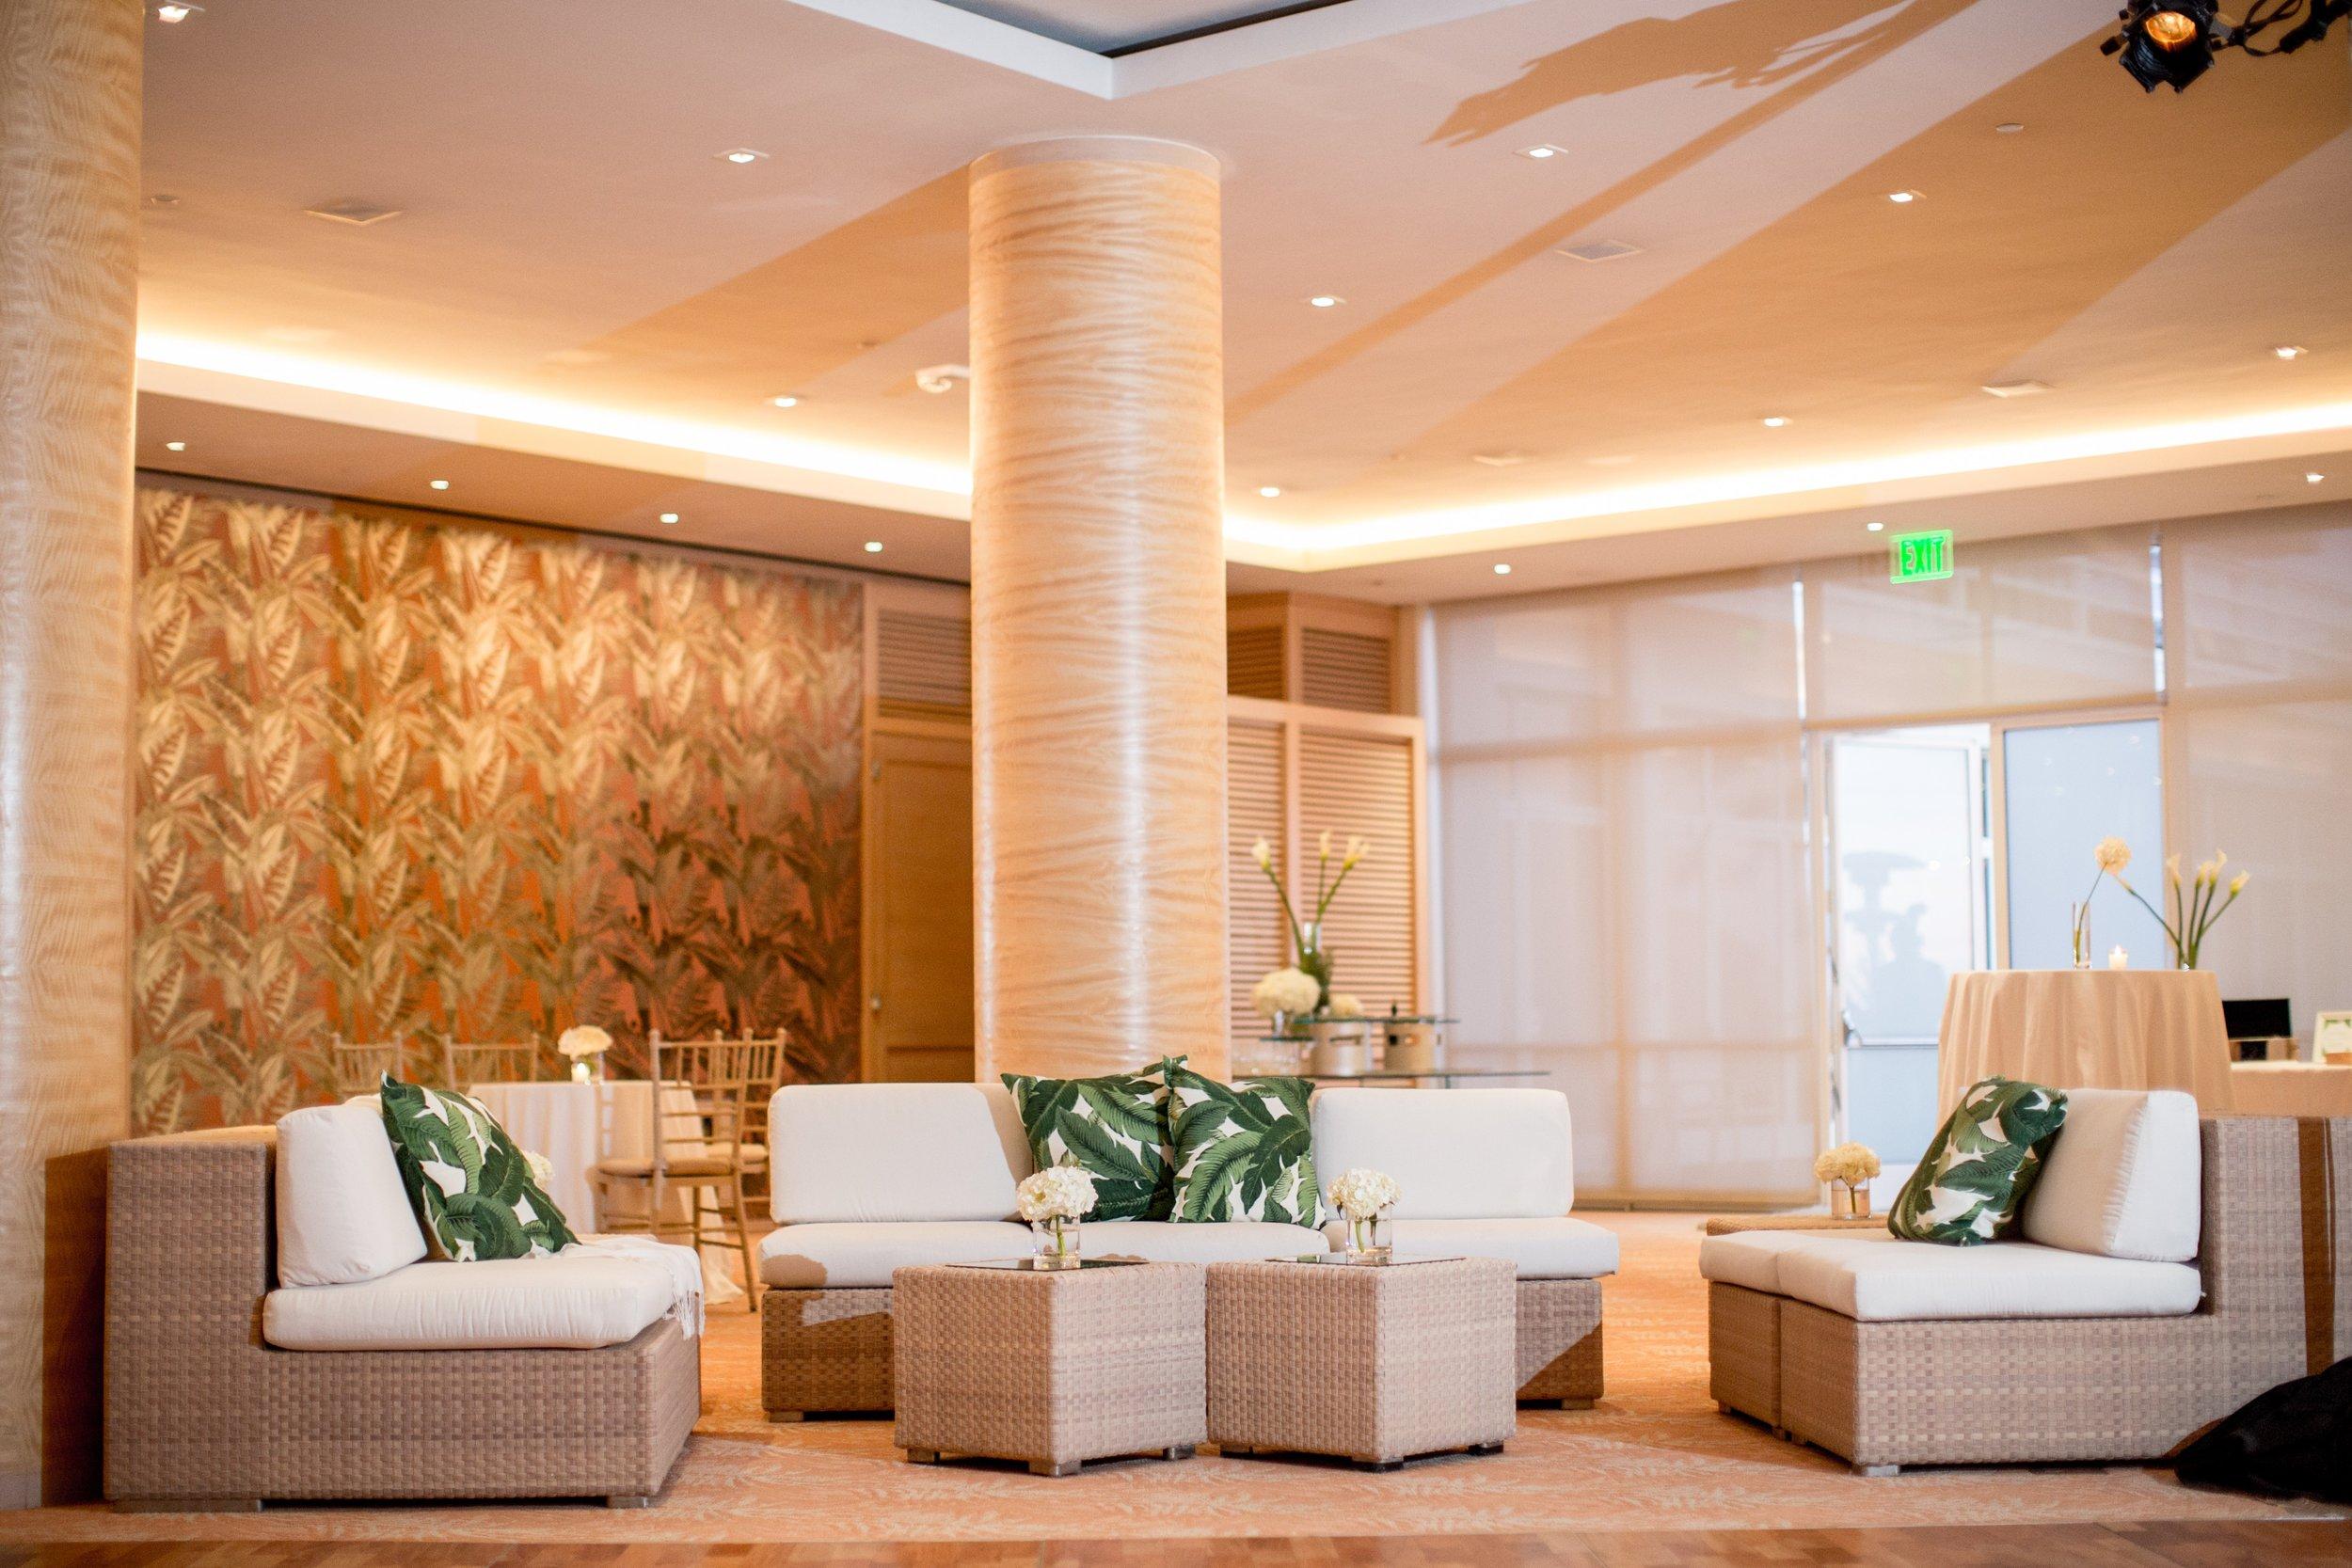 Coral Casino - Montecito Wedding - Michael and Anna Costa Photography